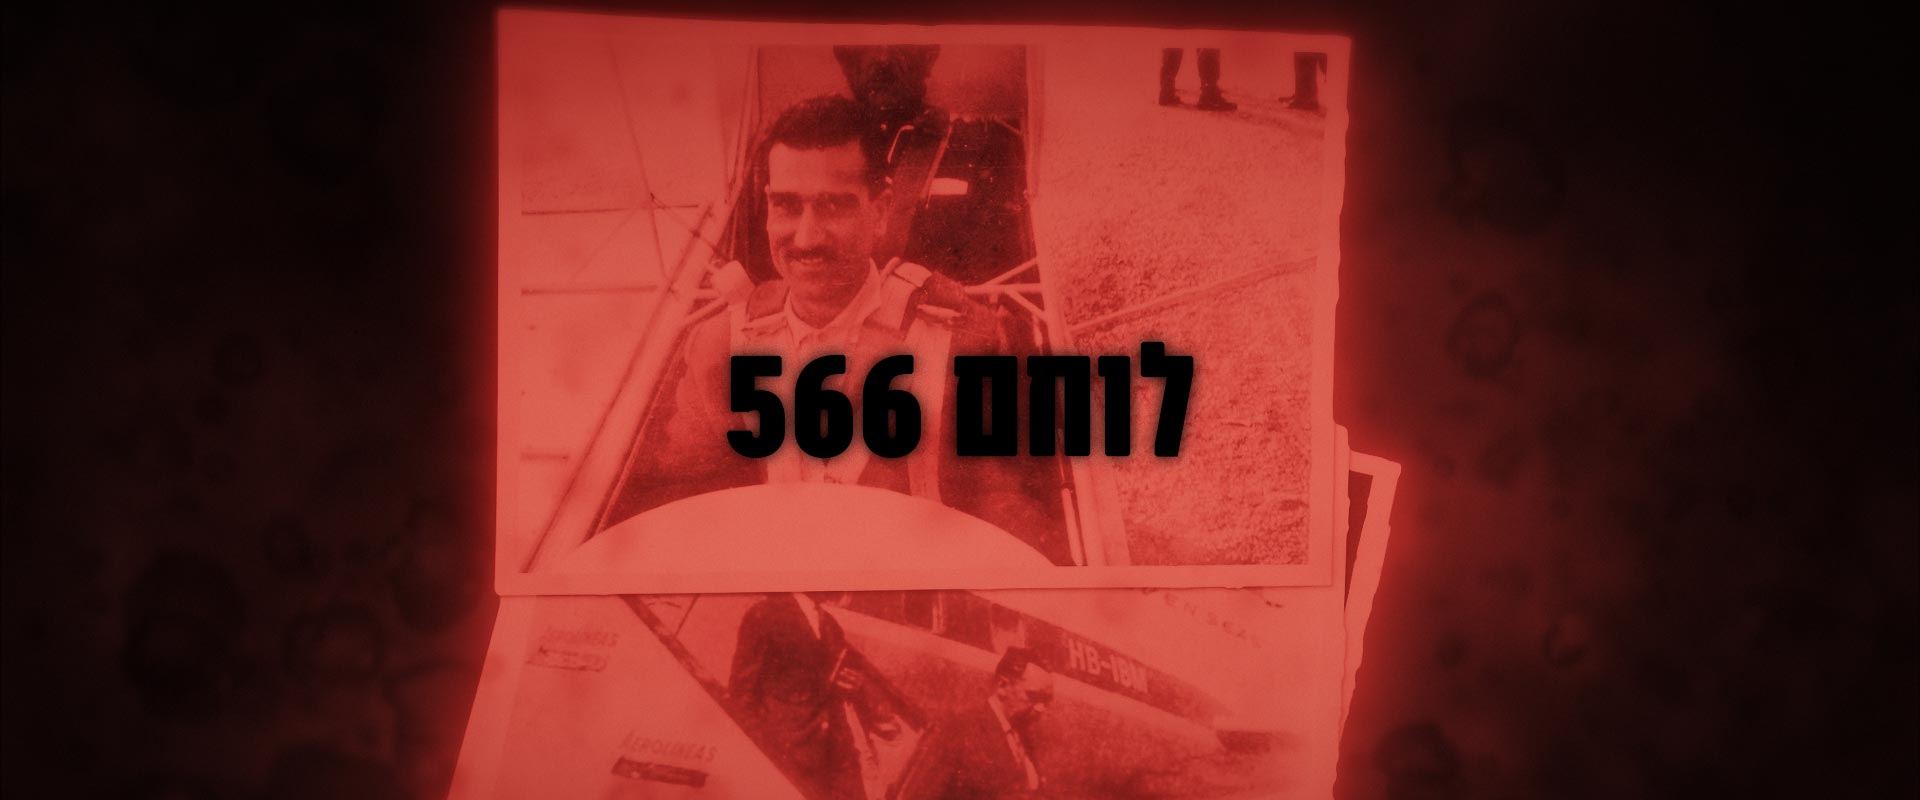 אלי כהן: לוחם 566